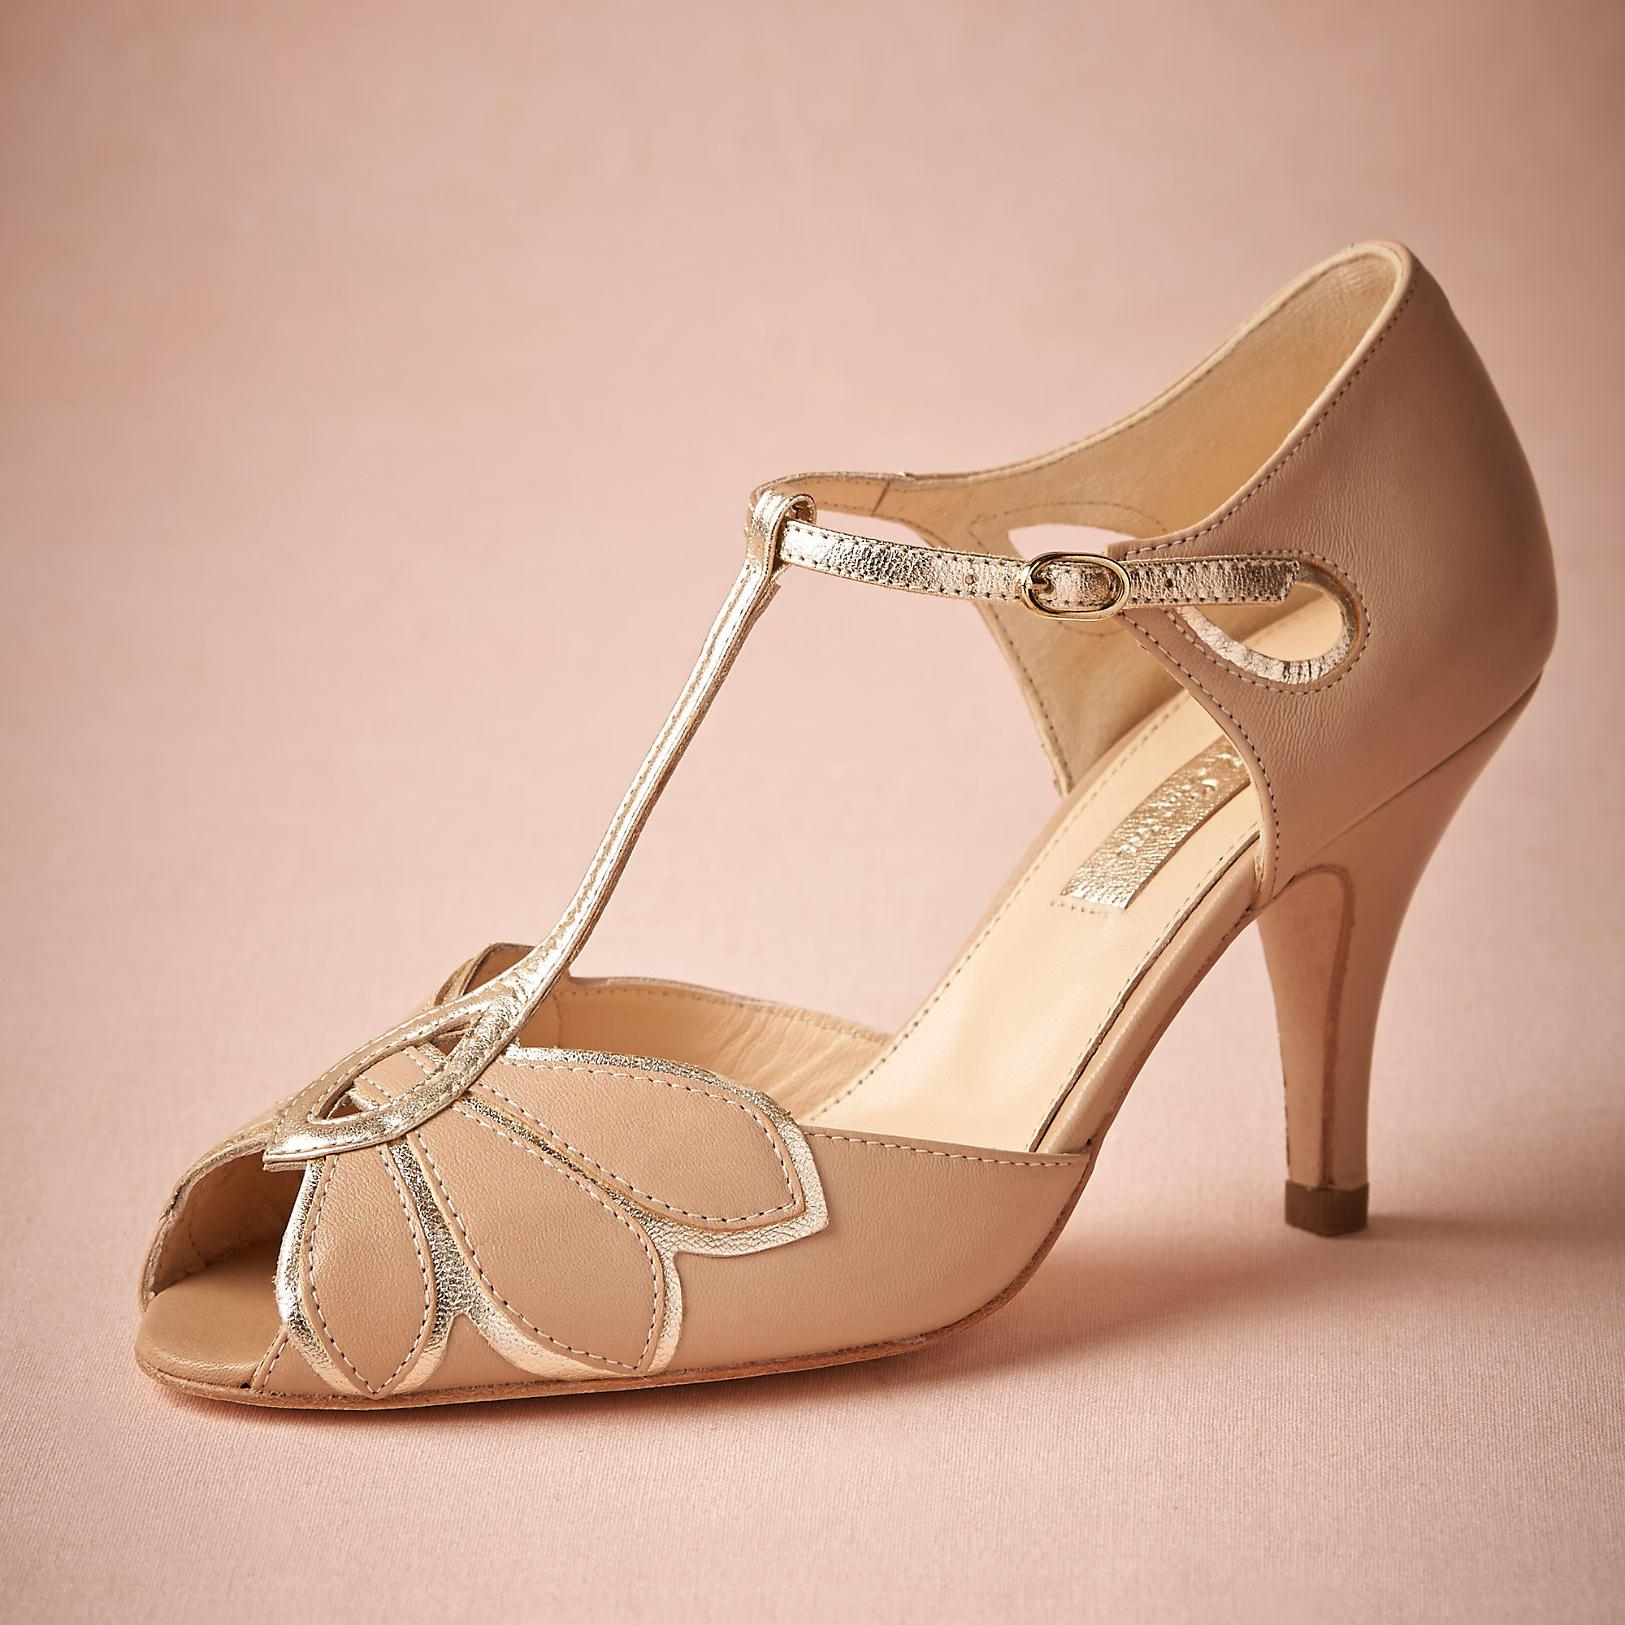 Vintage Blush Wedding Shoes For Women